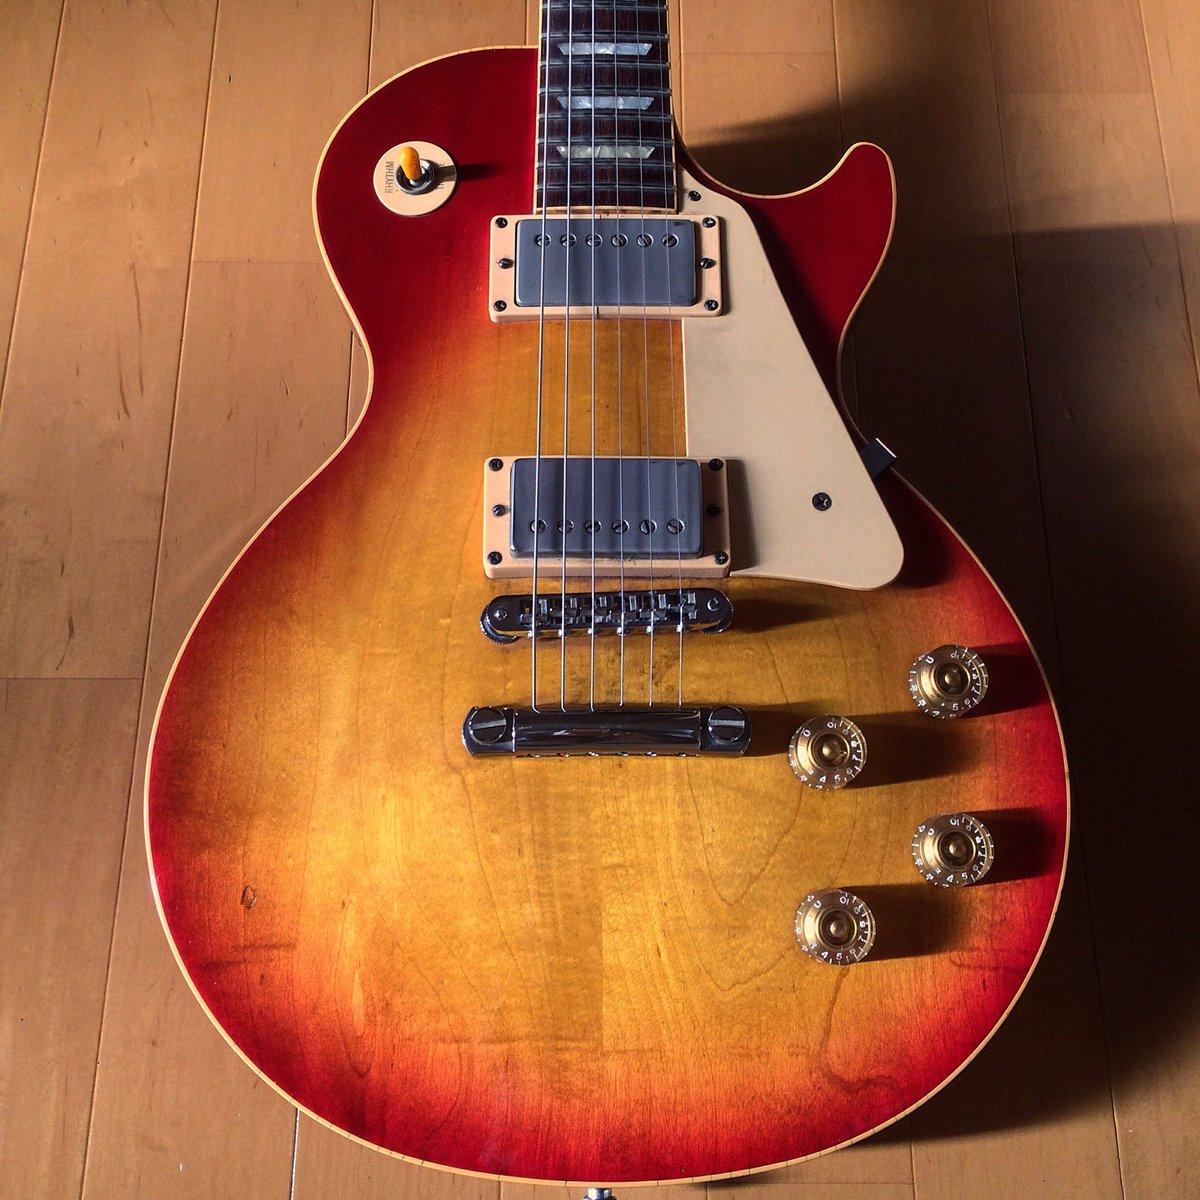 Gibson Les Paul Standard #guitar #gibson #lespaul<br>http://pic.twitter.com/DbvTWENxG7